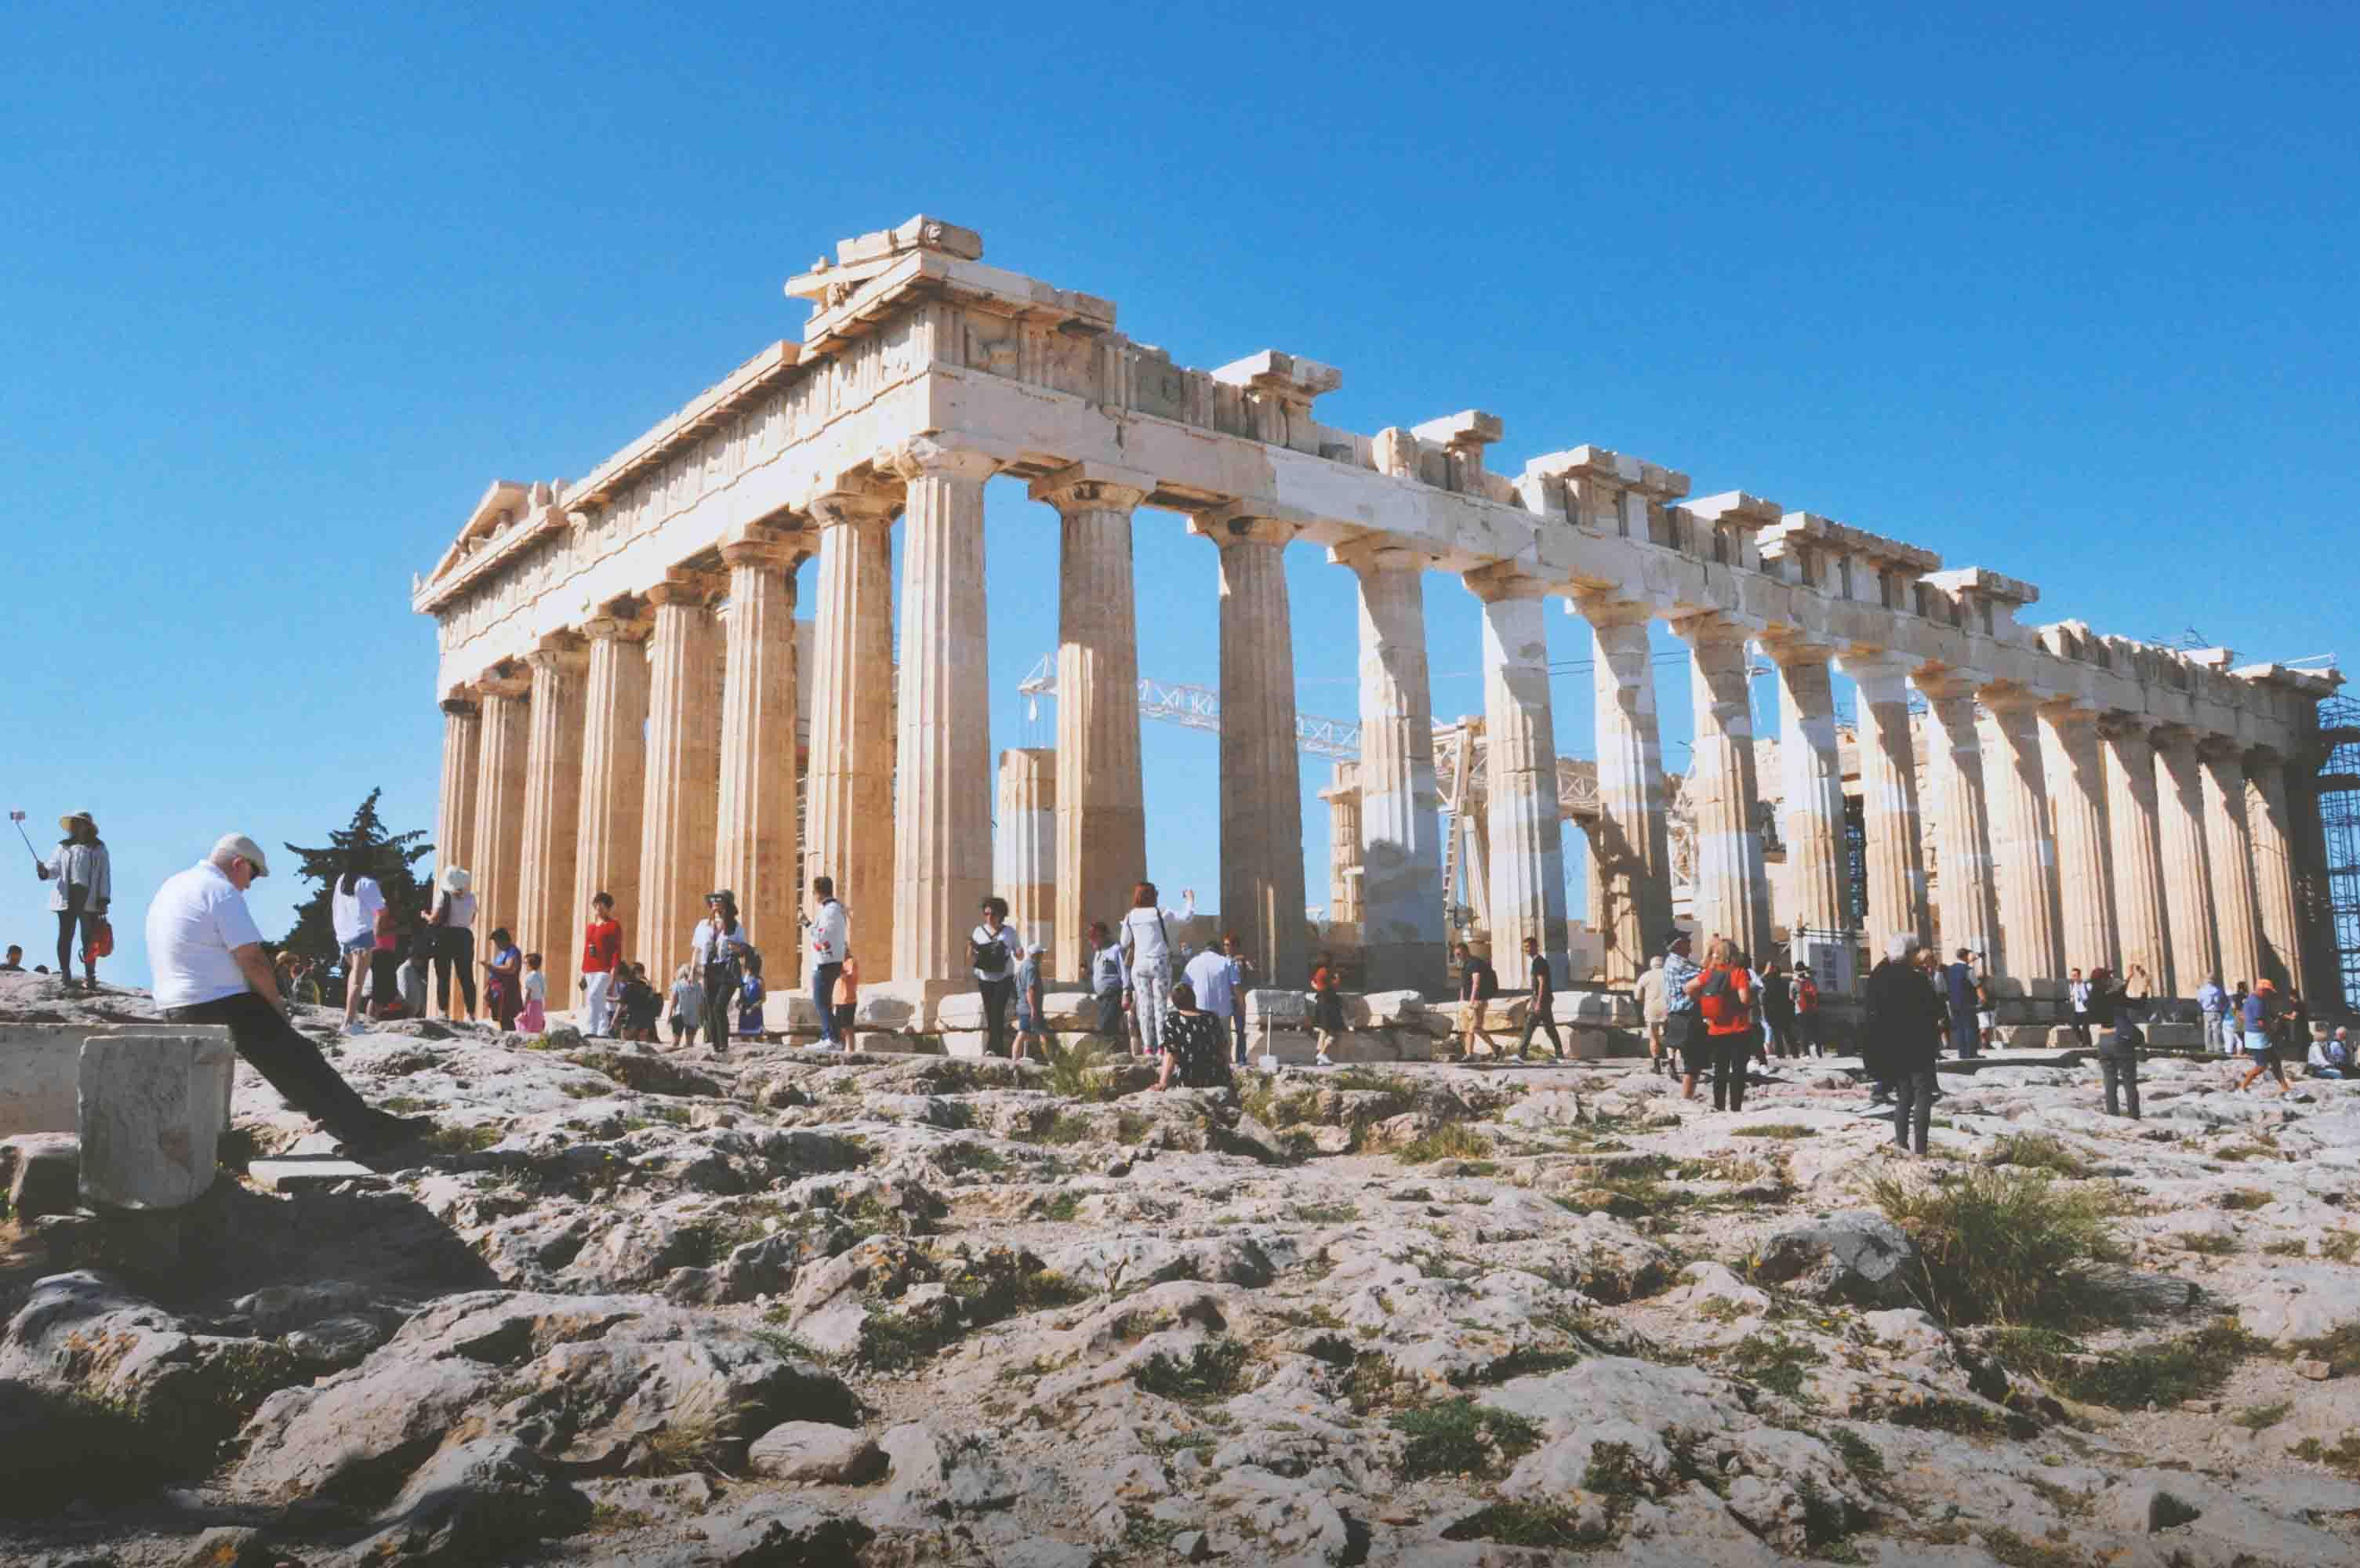 pháo đài Acropolis